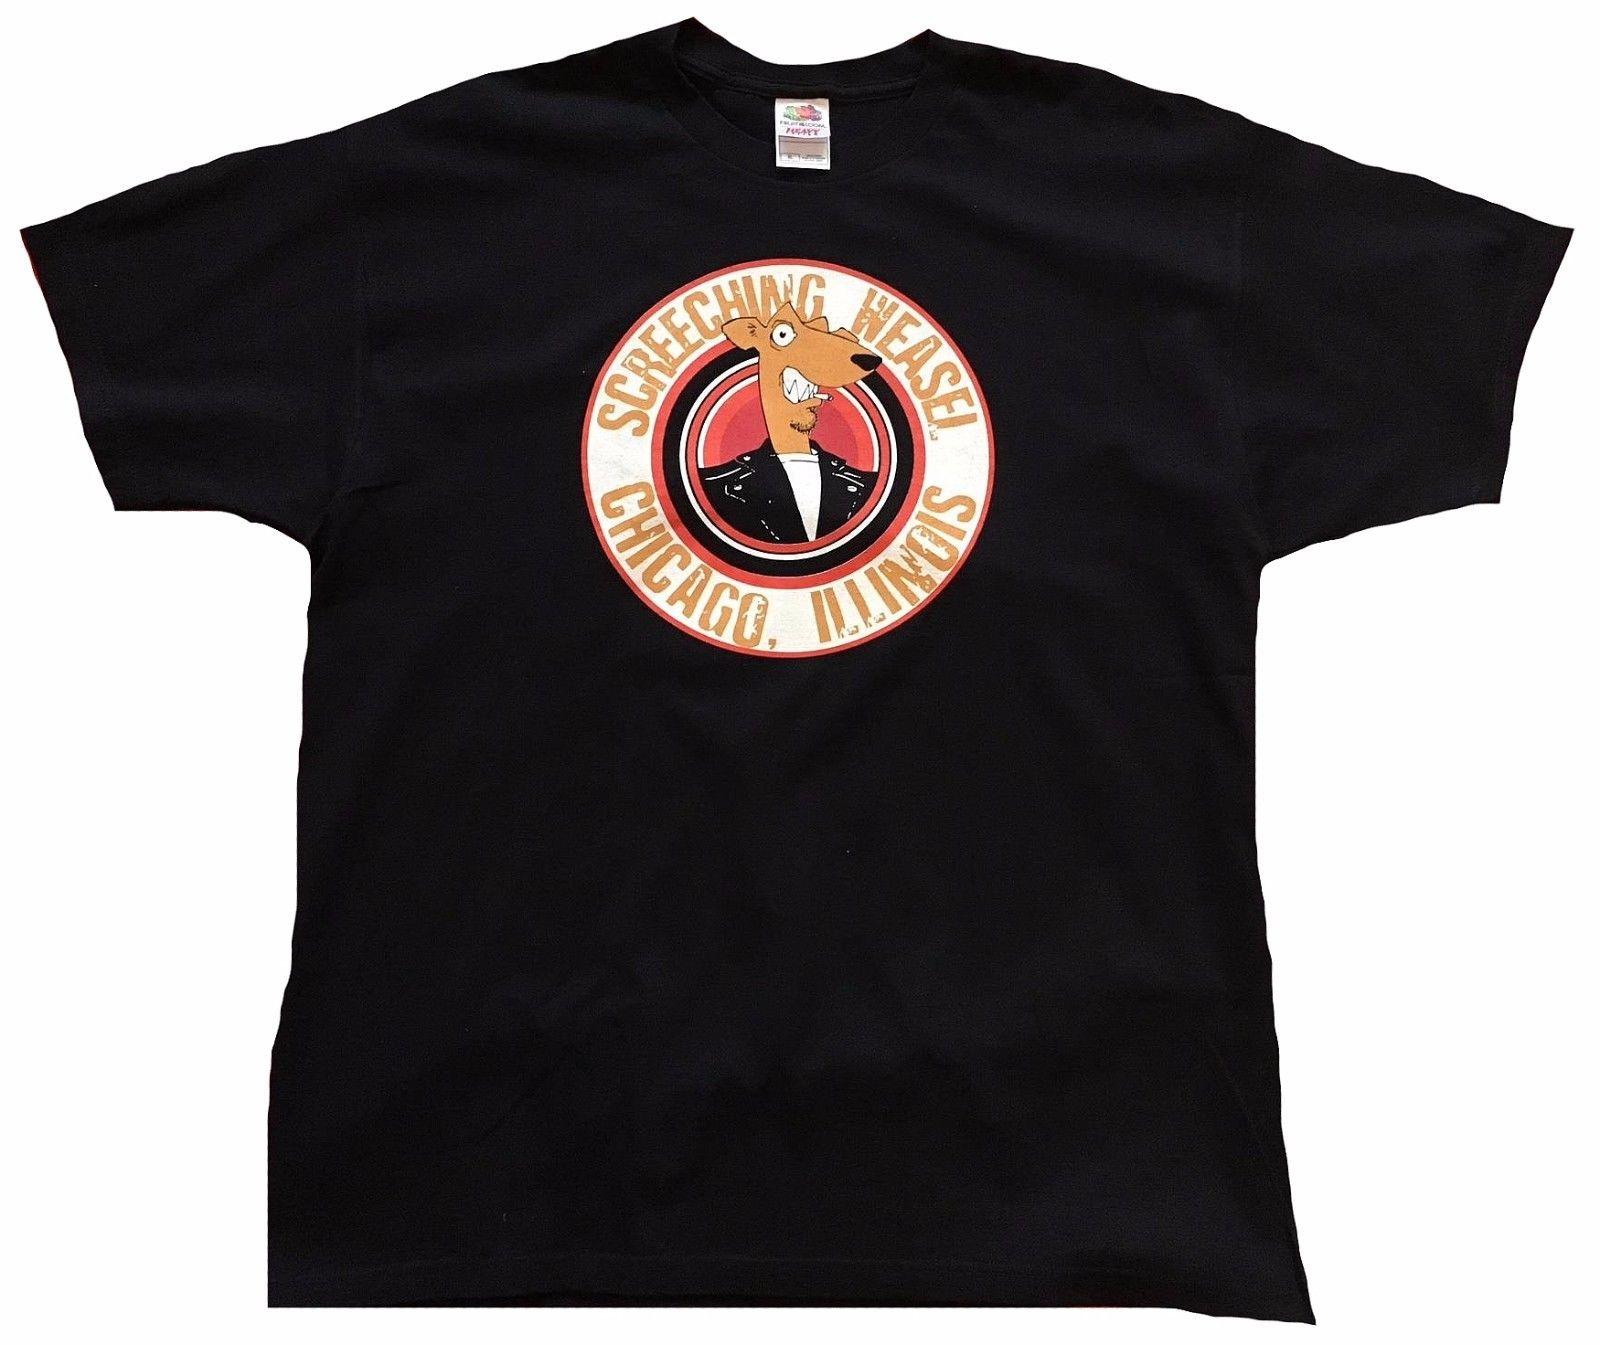 Rare Unworn Official Screeching Weasel Chicago Illinois Skate Punk T-Shirt 3XL Hot New 2018 Summer Fashion T Shirts Top Tee ...